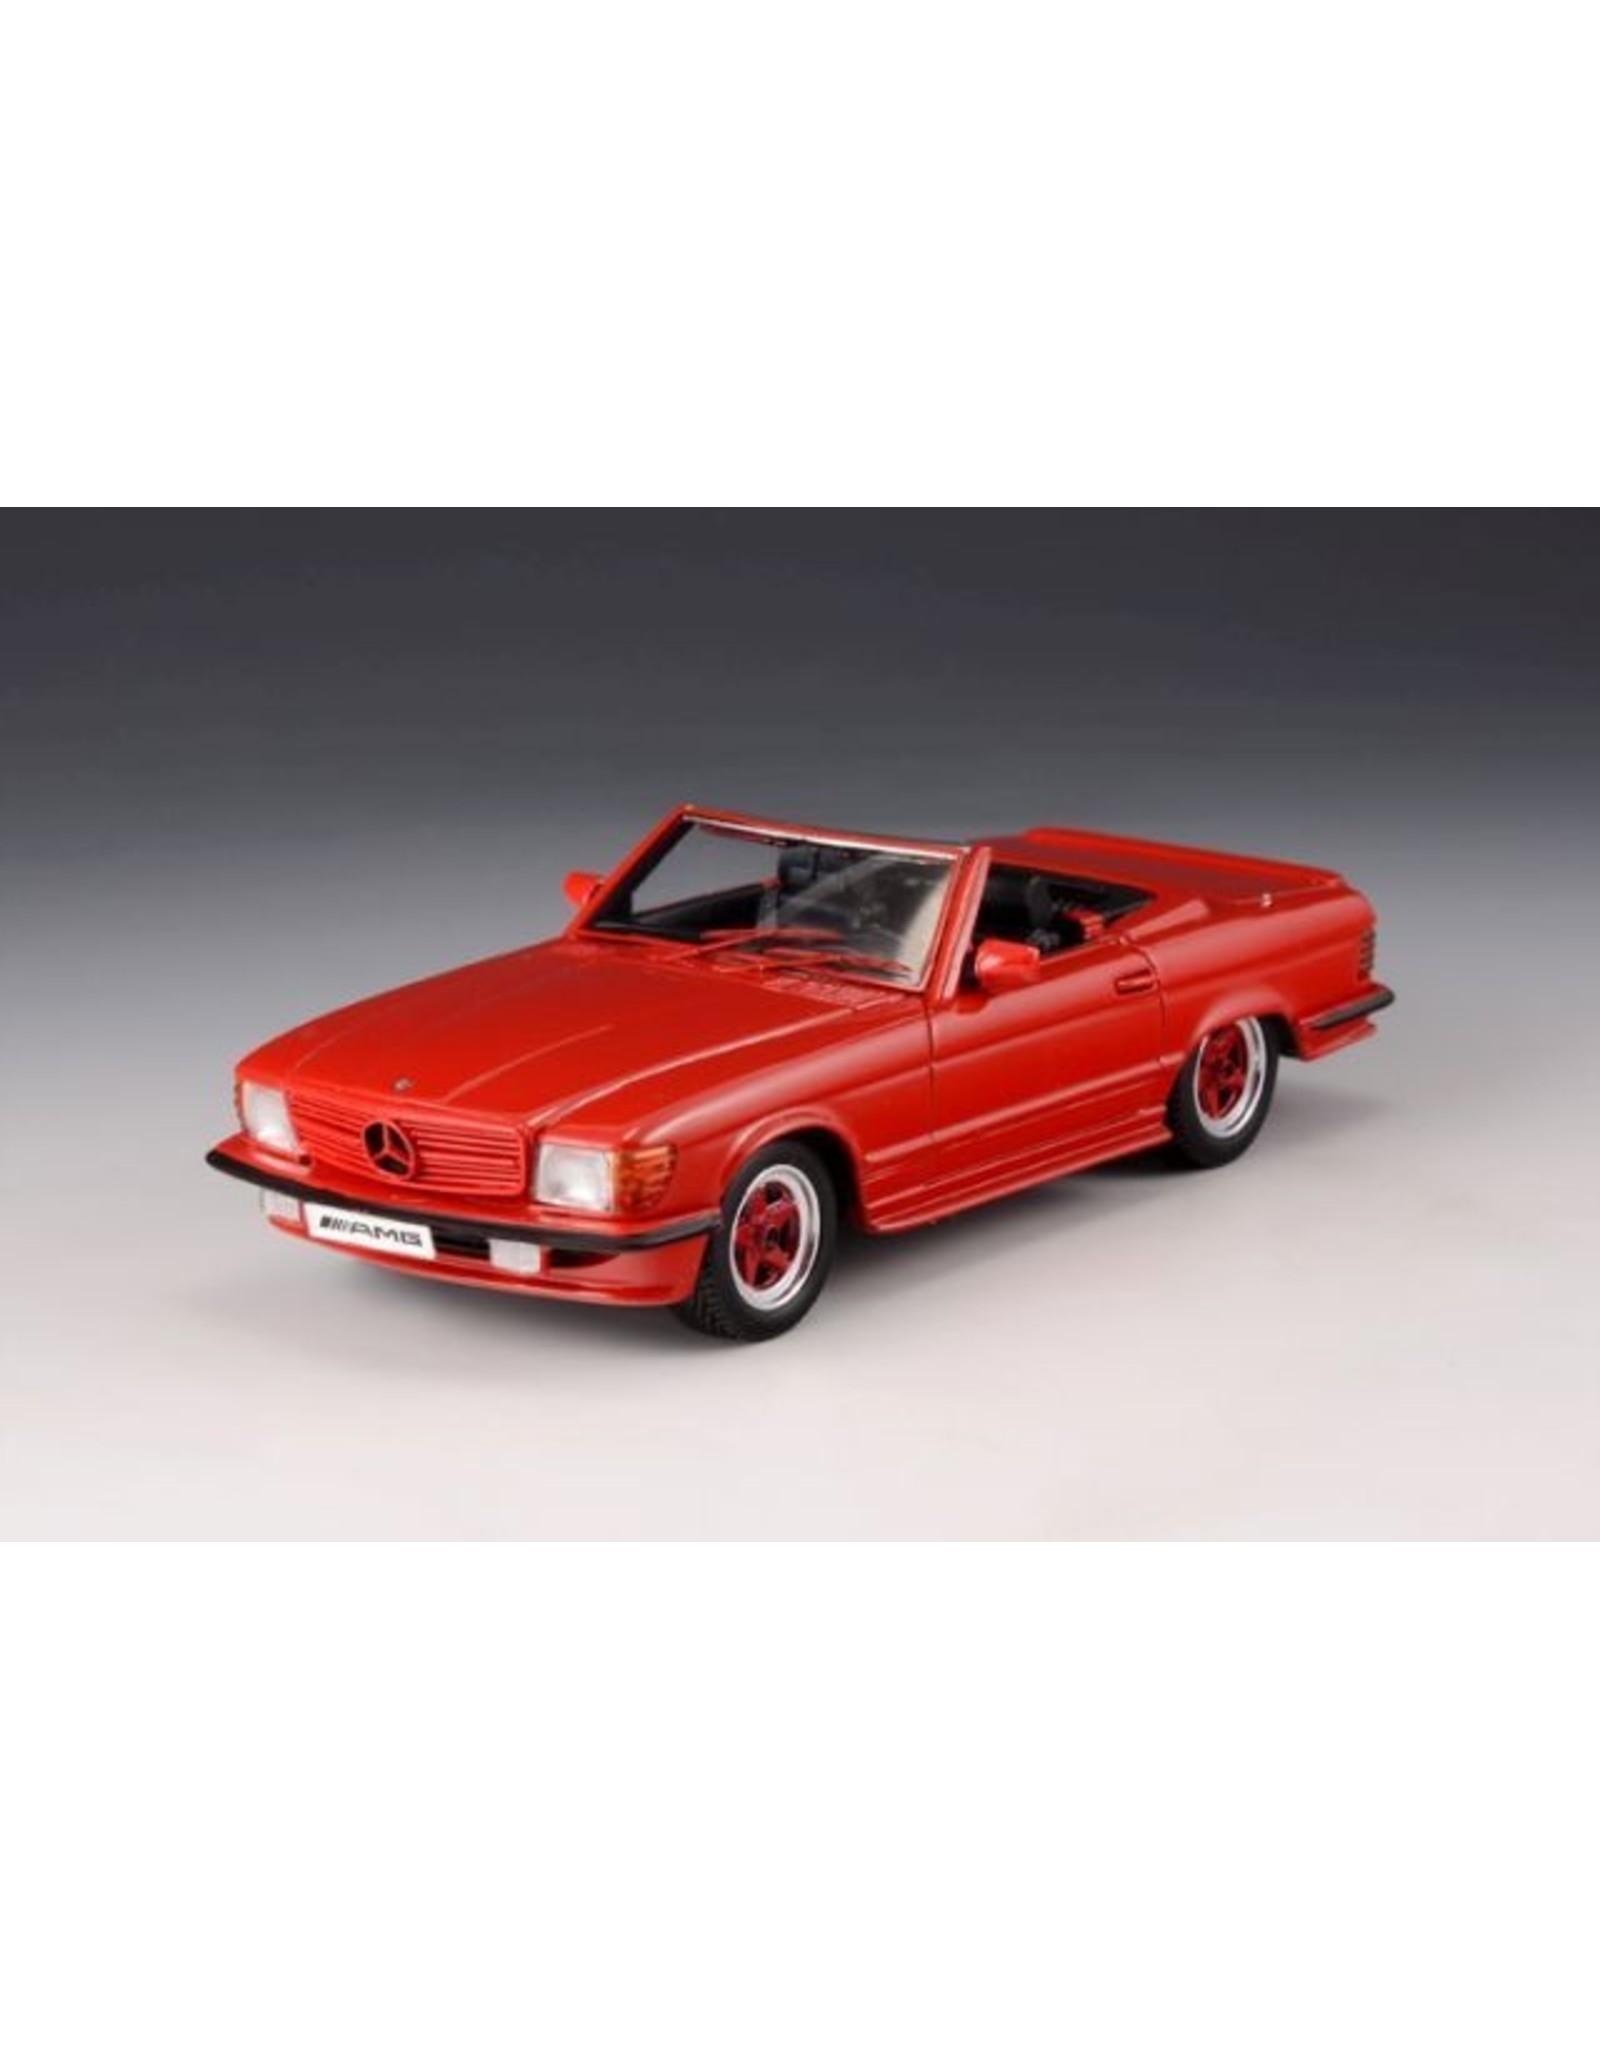 Mercedes-Benz by AMG AMG 500SL R107 MERCEDES-BENZ-1983(red)